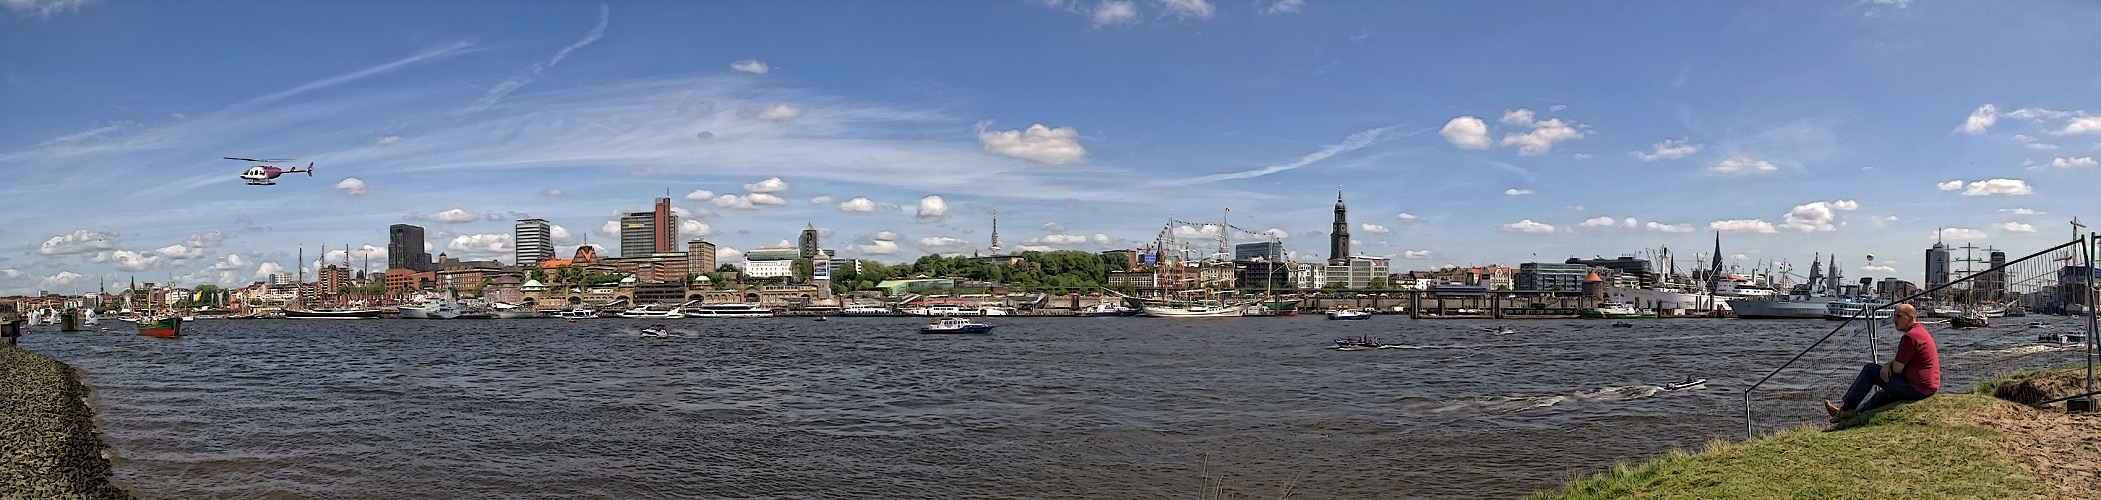 Hafengeburtstag 2009